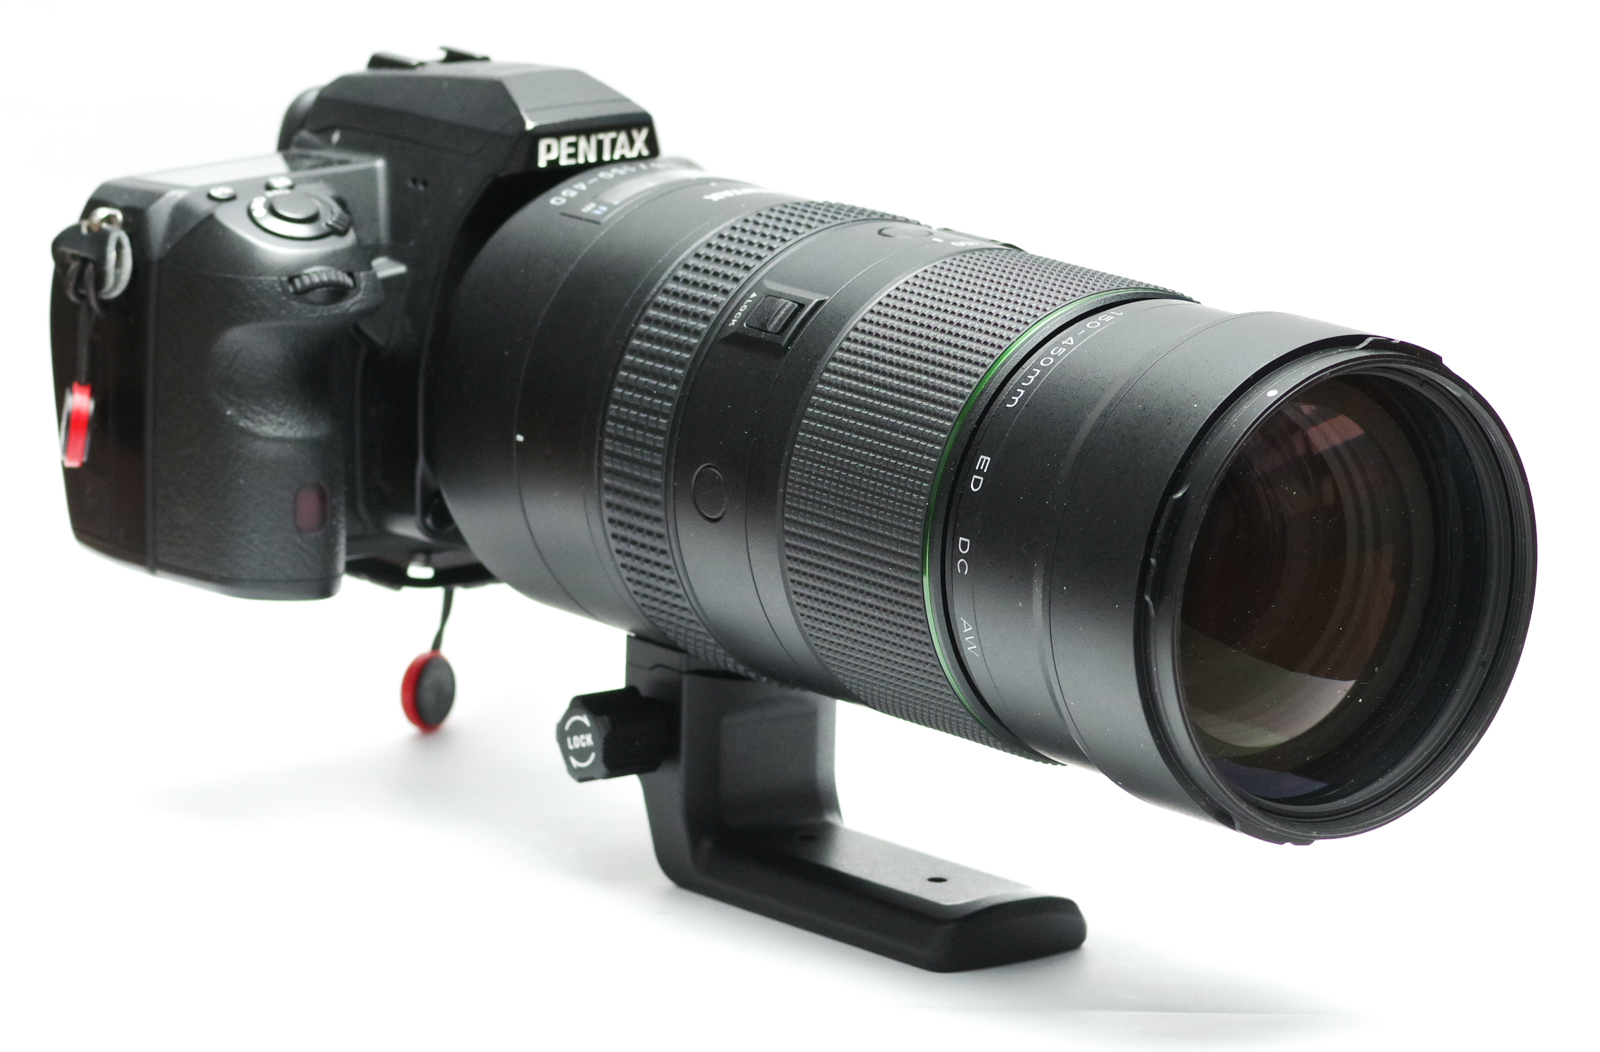 Hd Pentax D Fa 150 450mm F4 5 5 6 Review Construction